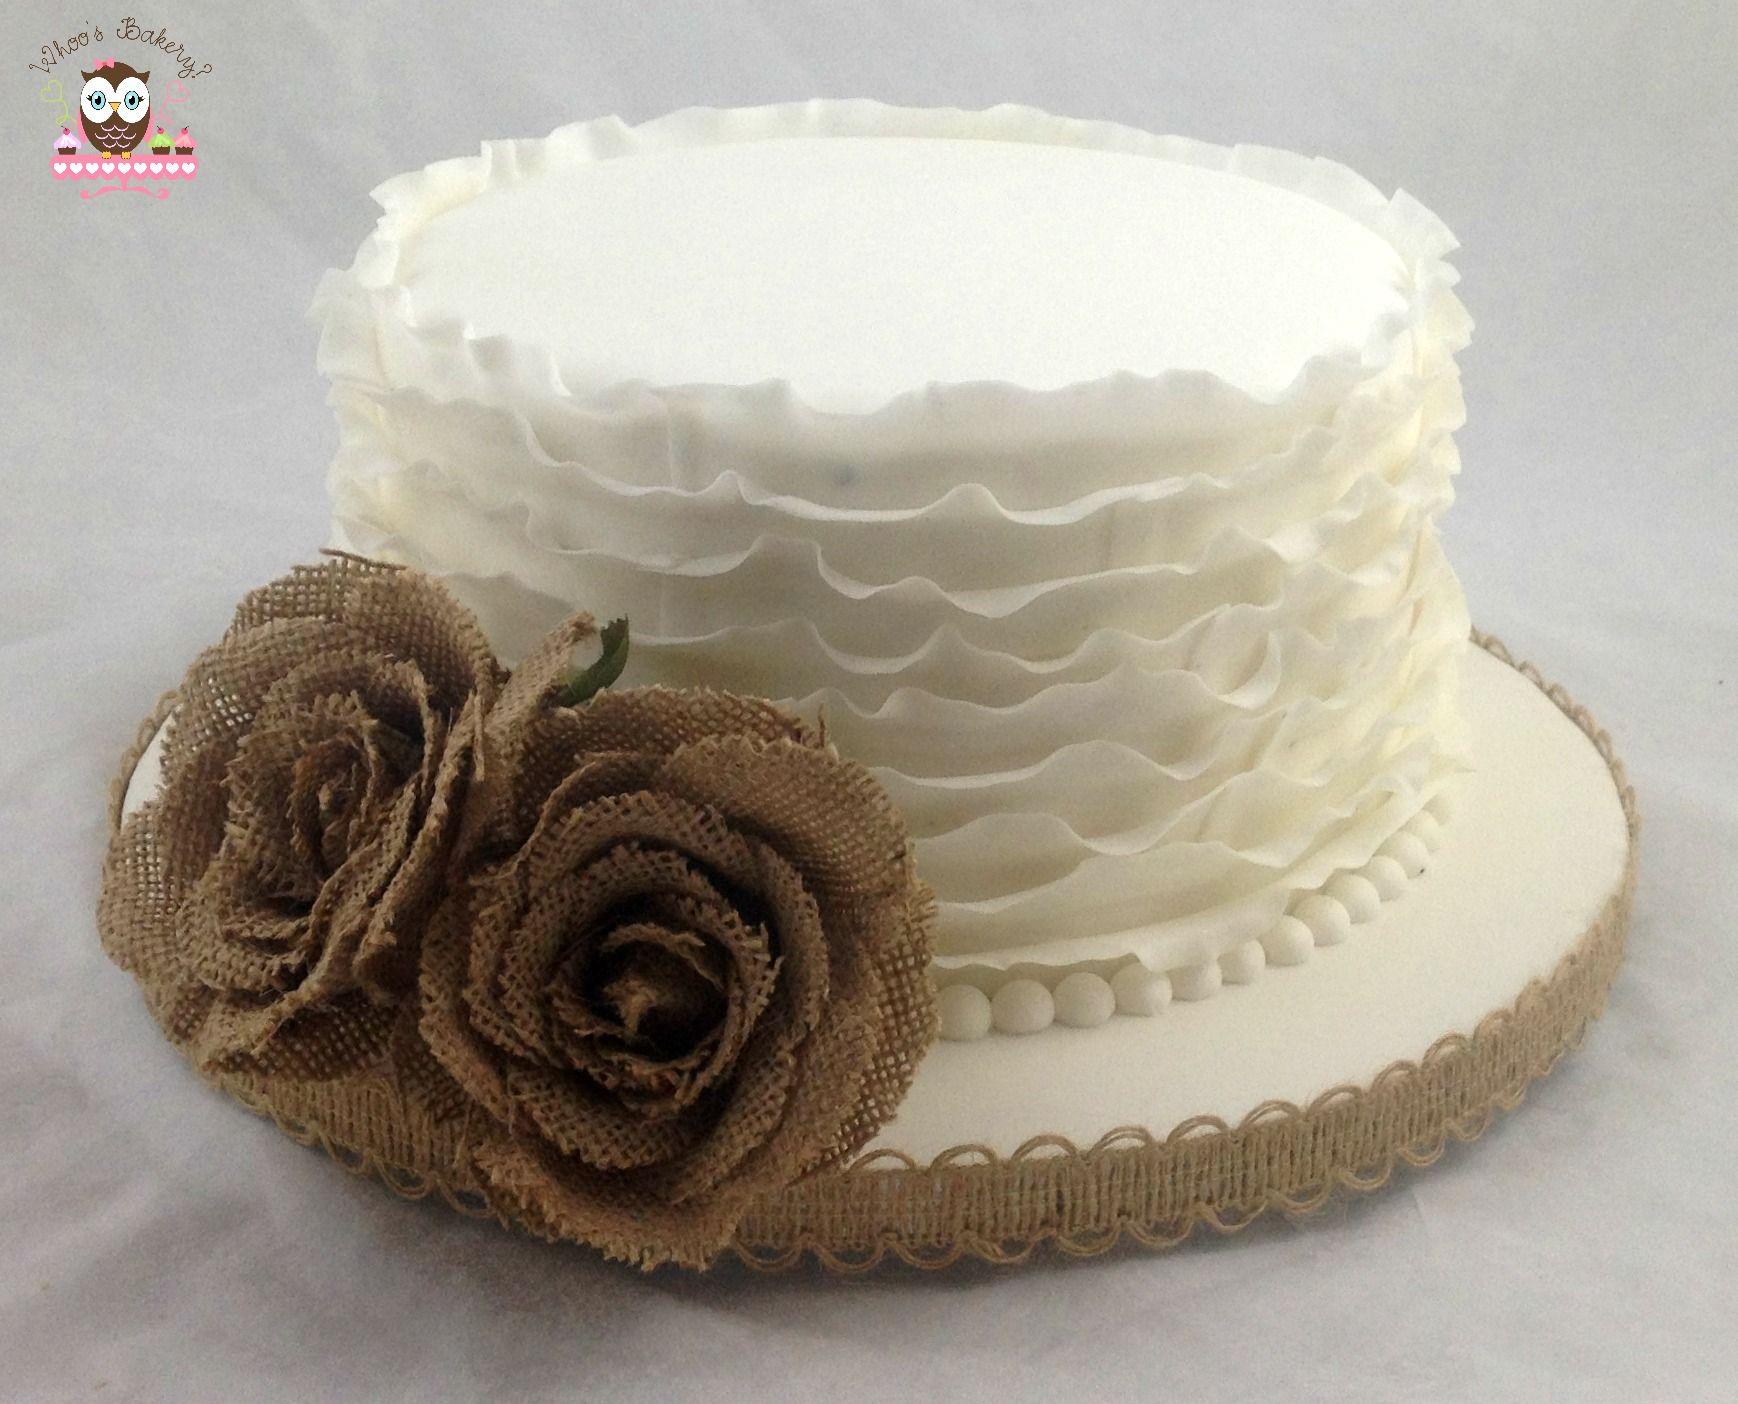 ruffle cake burlap cake elegant wedding cake simple wedding cake small wedding cake cakes. Black Bedroom Furniture Sets. Home Design Ideas